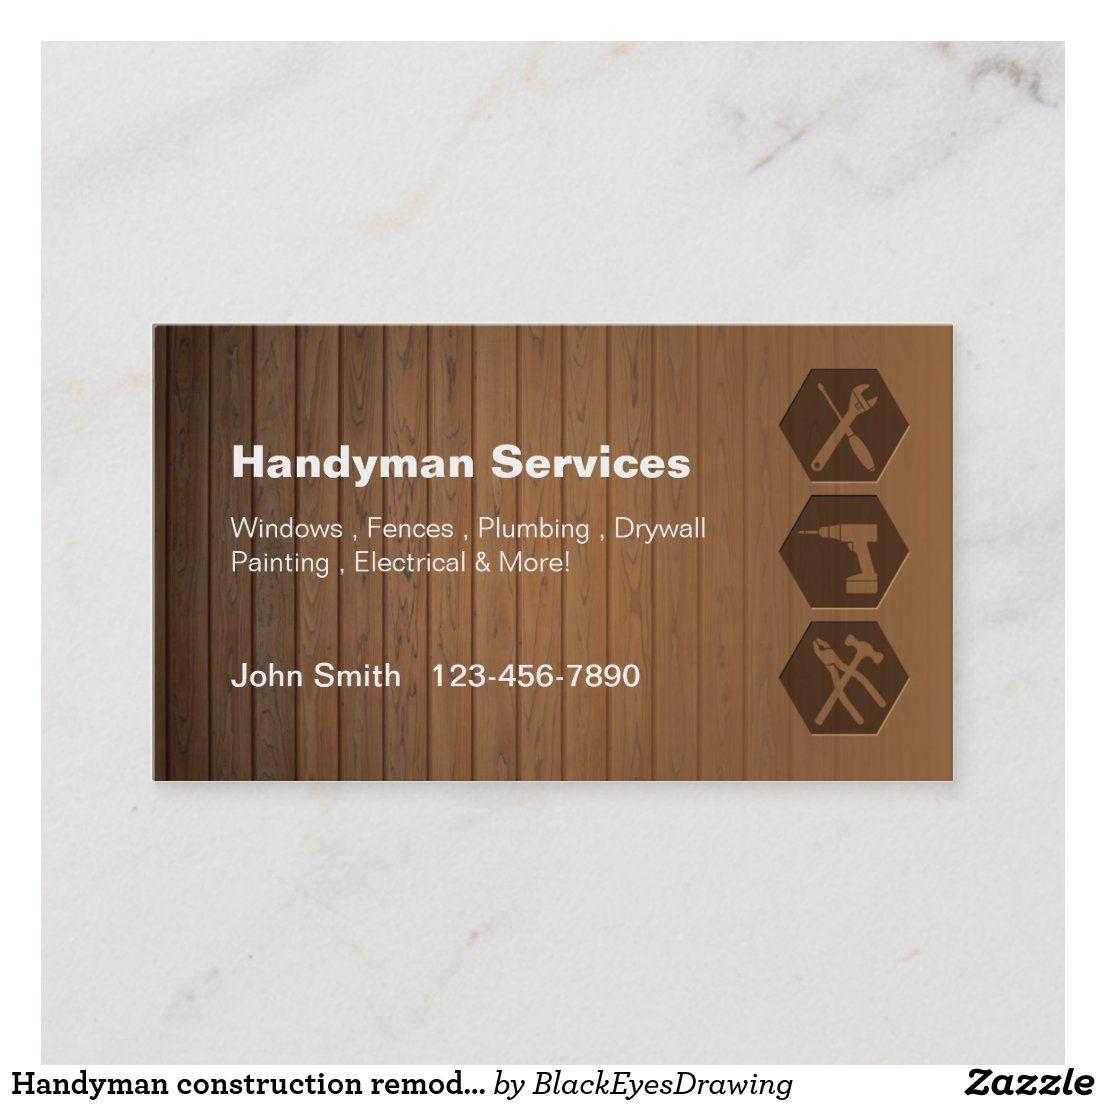 Handyman Construction Remodeling Business Cards Zazzle Com In 2021 Remodeling Business Construction Remodeling Handyman